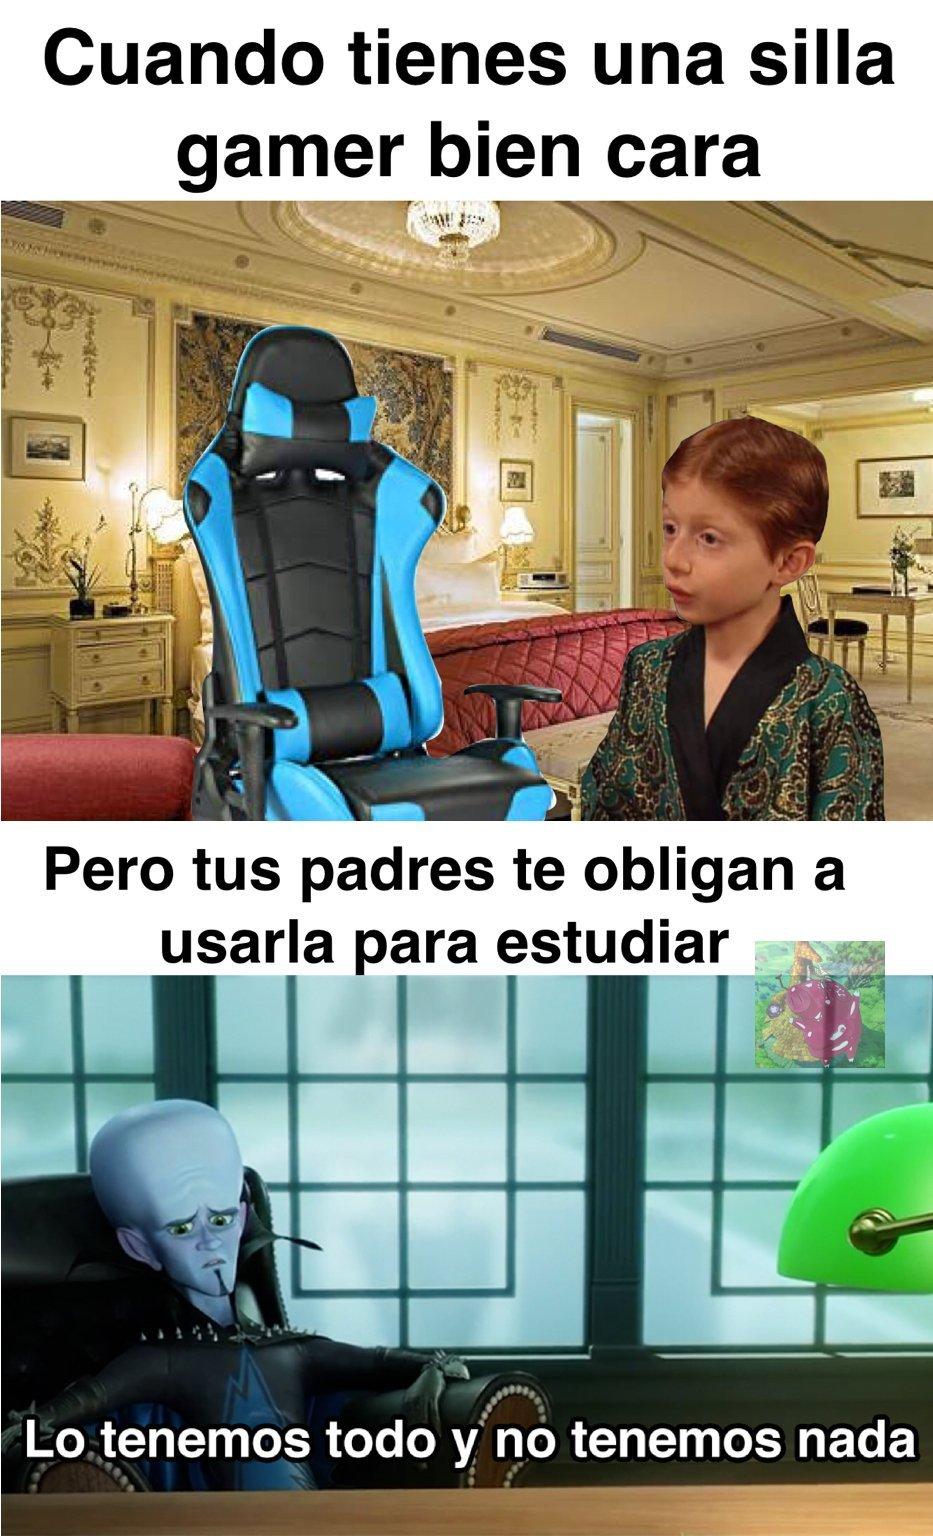 Meme gaming